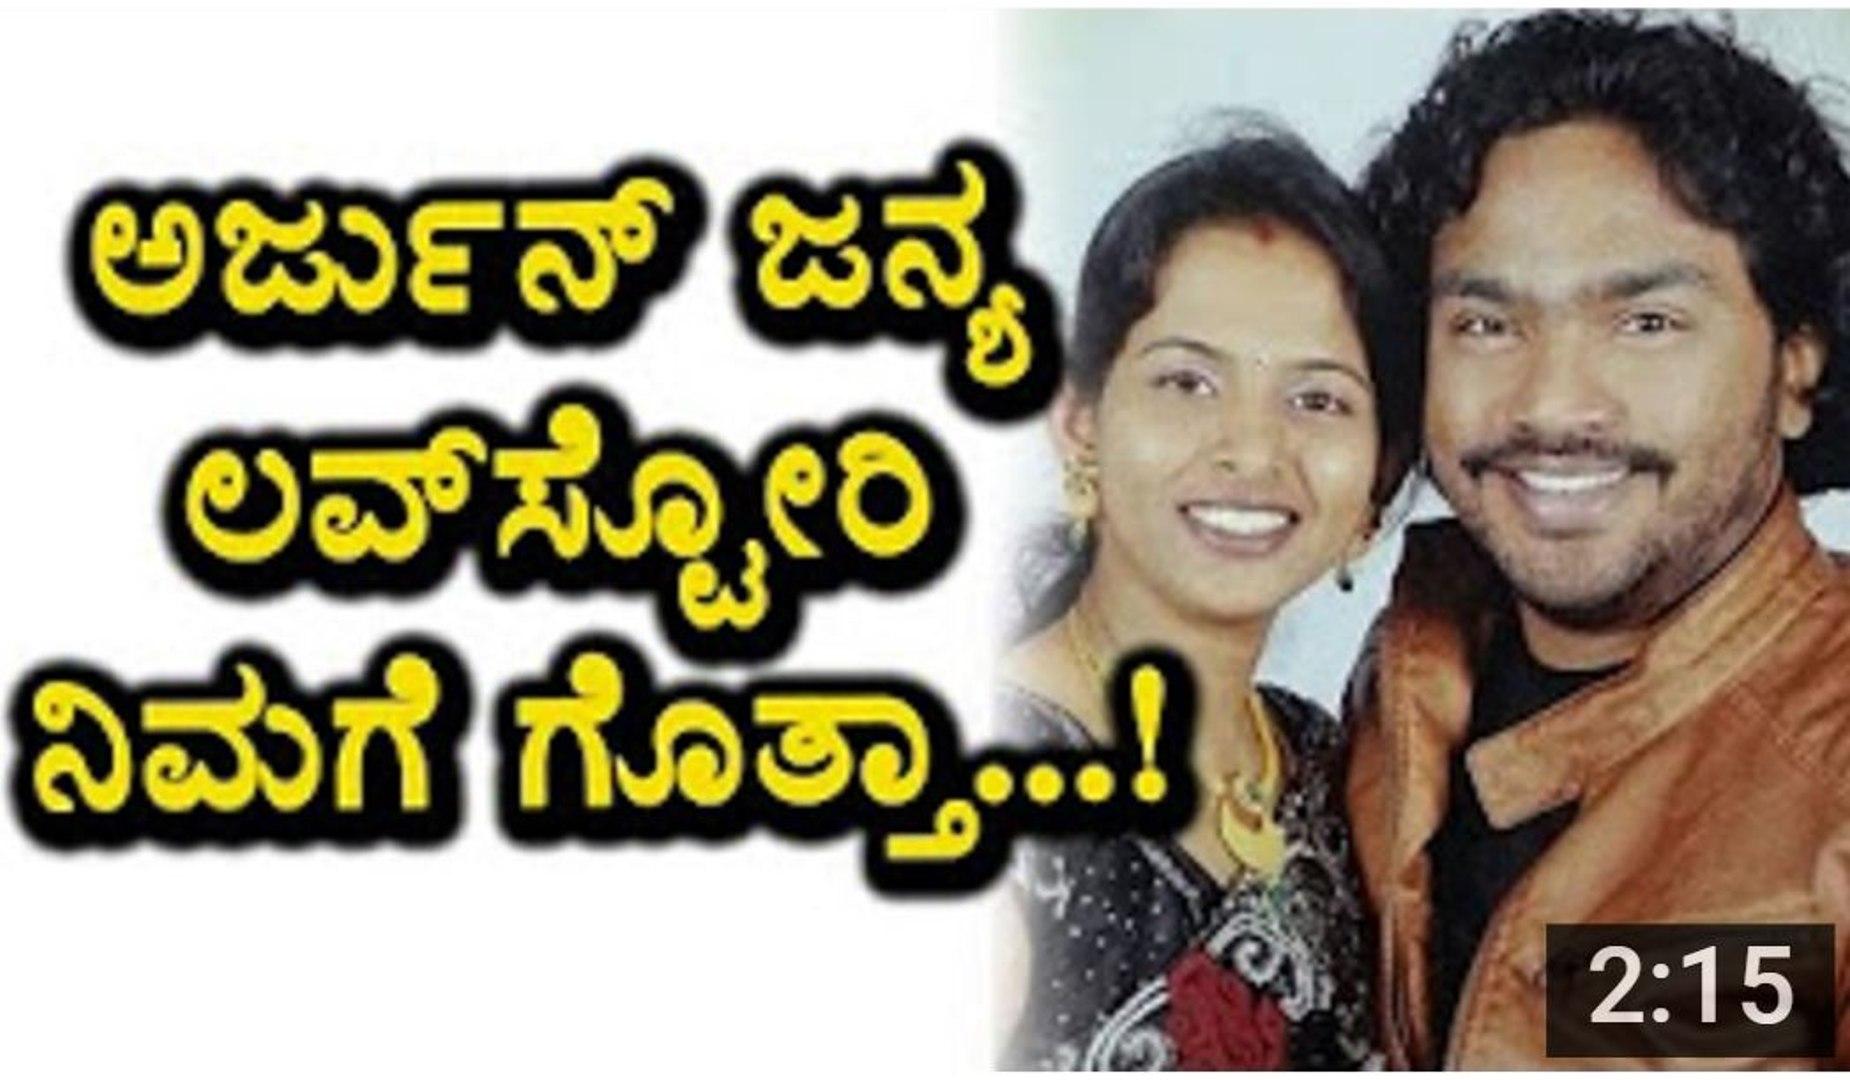 Arjun Janya Love story secrete reveled - Interesting Love story behind Arjun Janya - Top Kannada TV